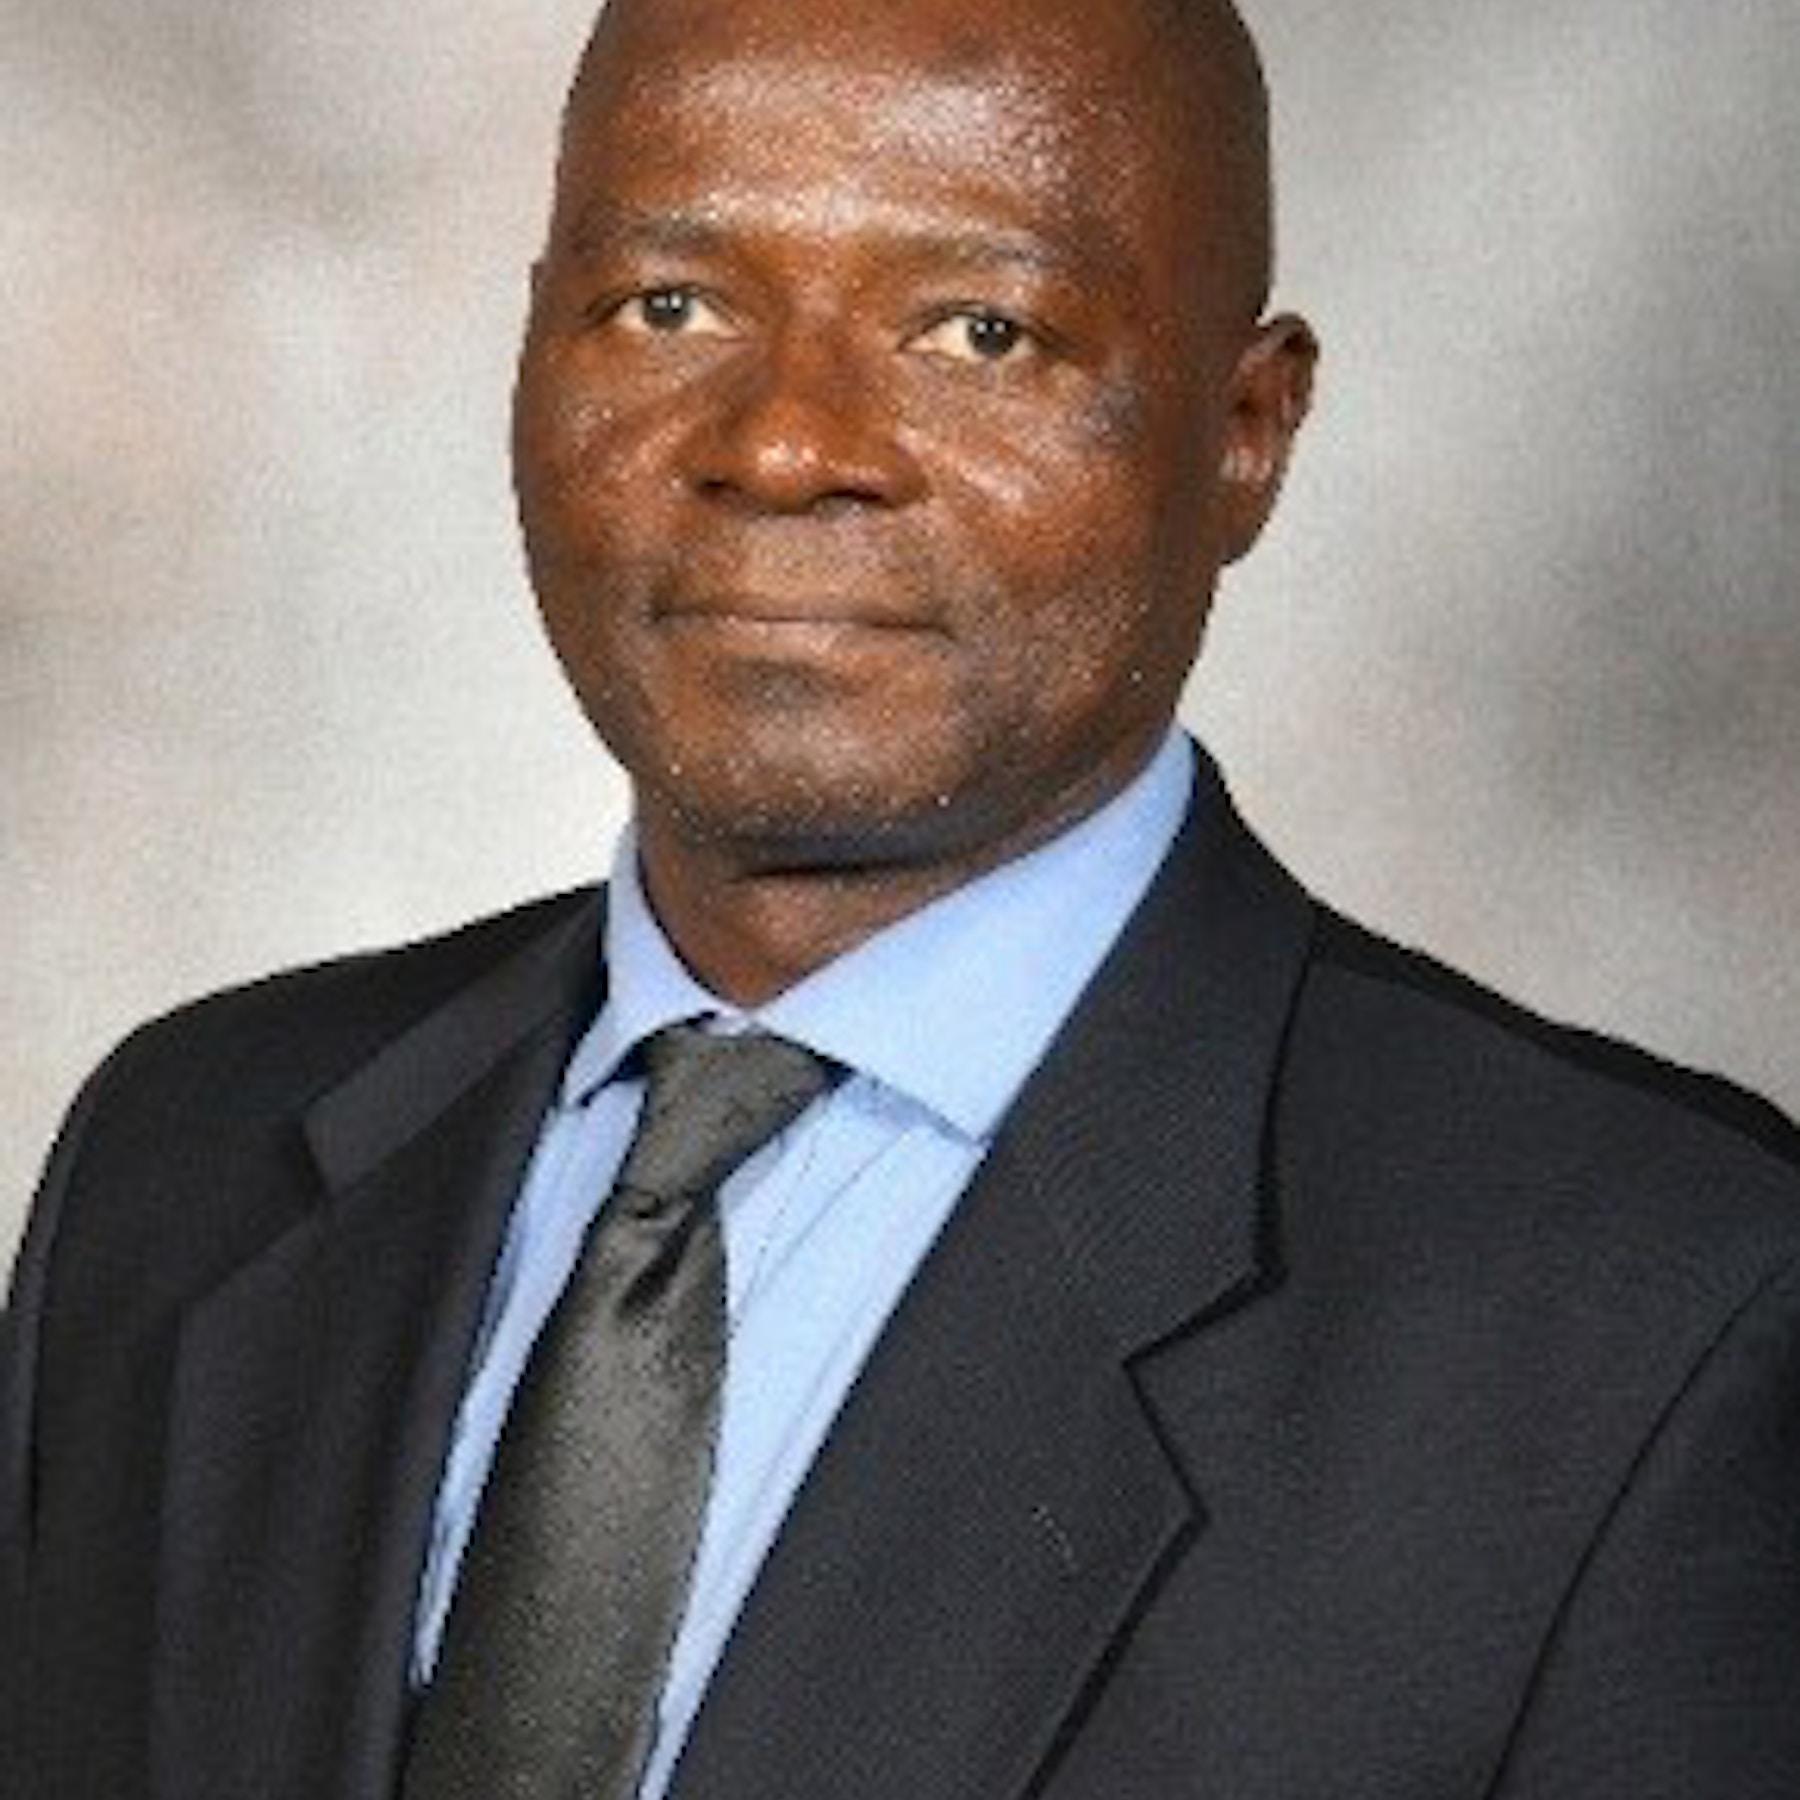 Mr-Fhatuwani-Ramagwede